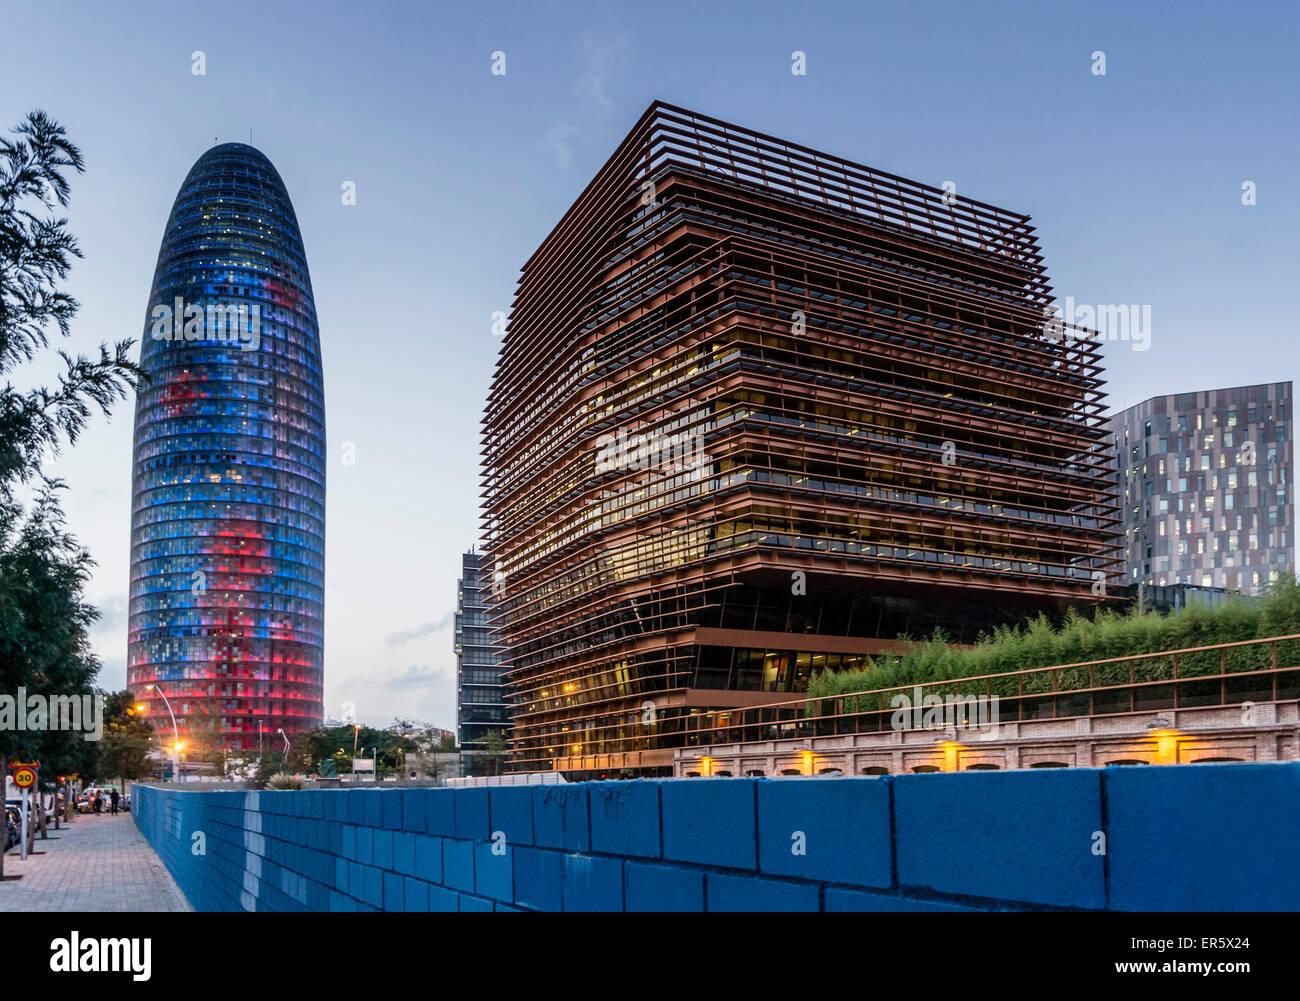 Modern Architecture Barcelona torre agbar, head offices of cmt, modern architecture, barcelona